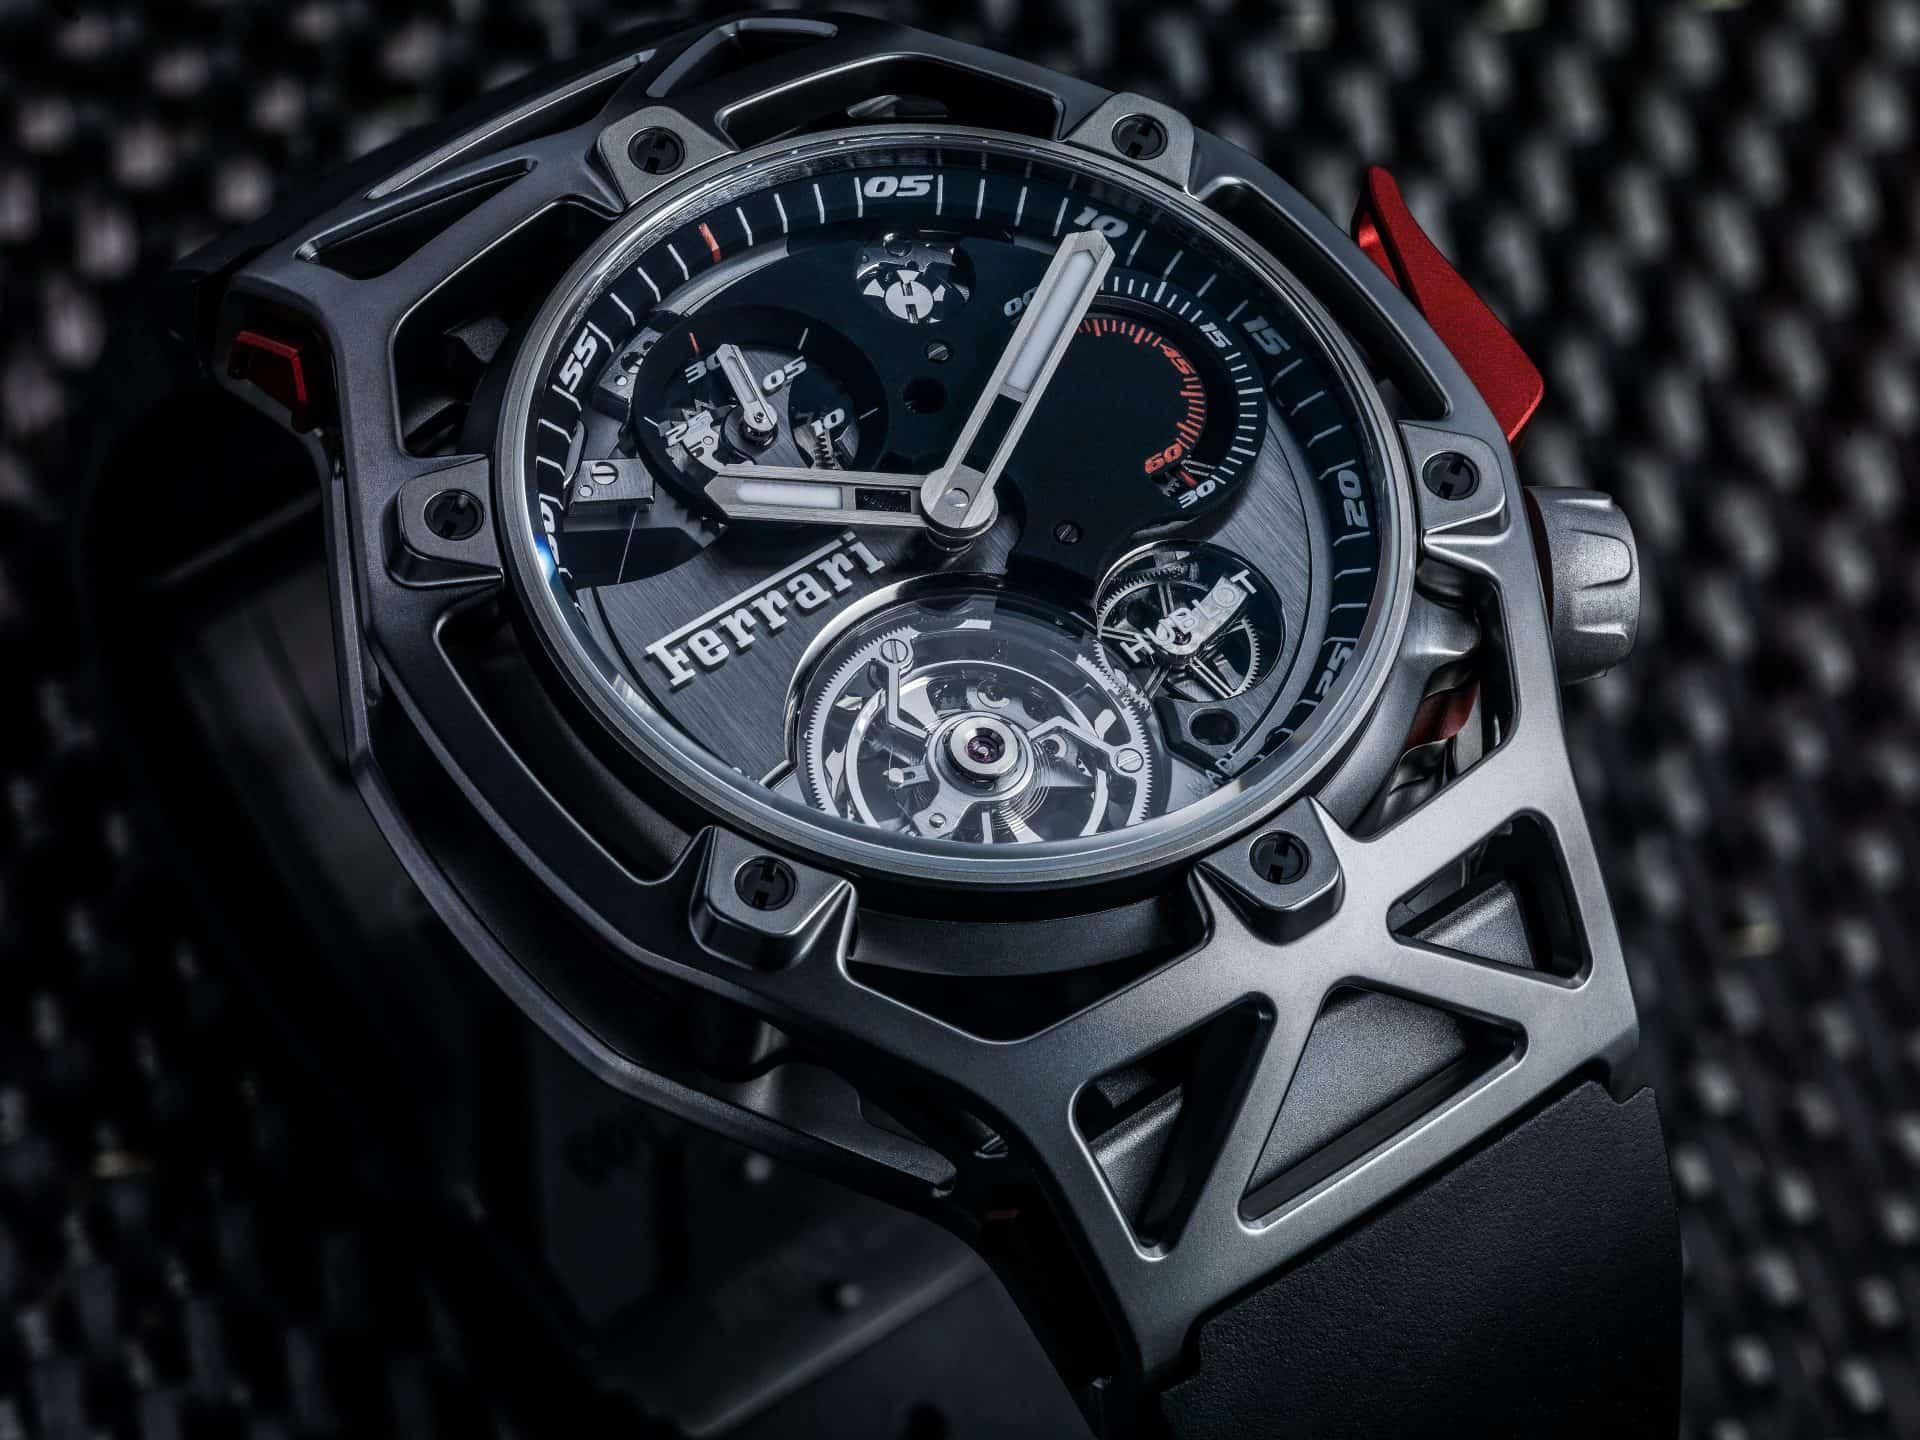 Die markante Gehäuseform der Hublot Techframe Ferrari 70 Years Tourbillon Chronograph